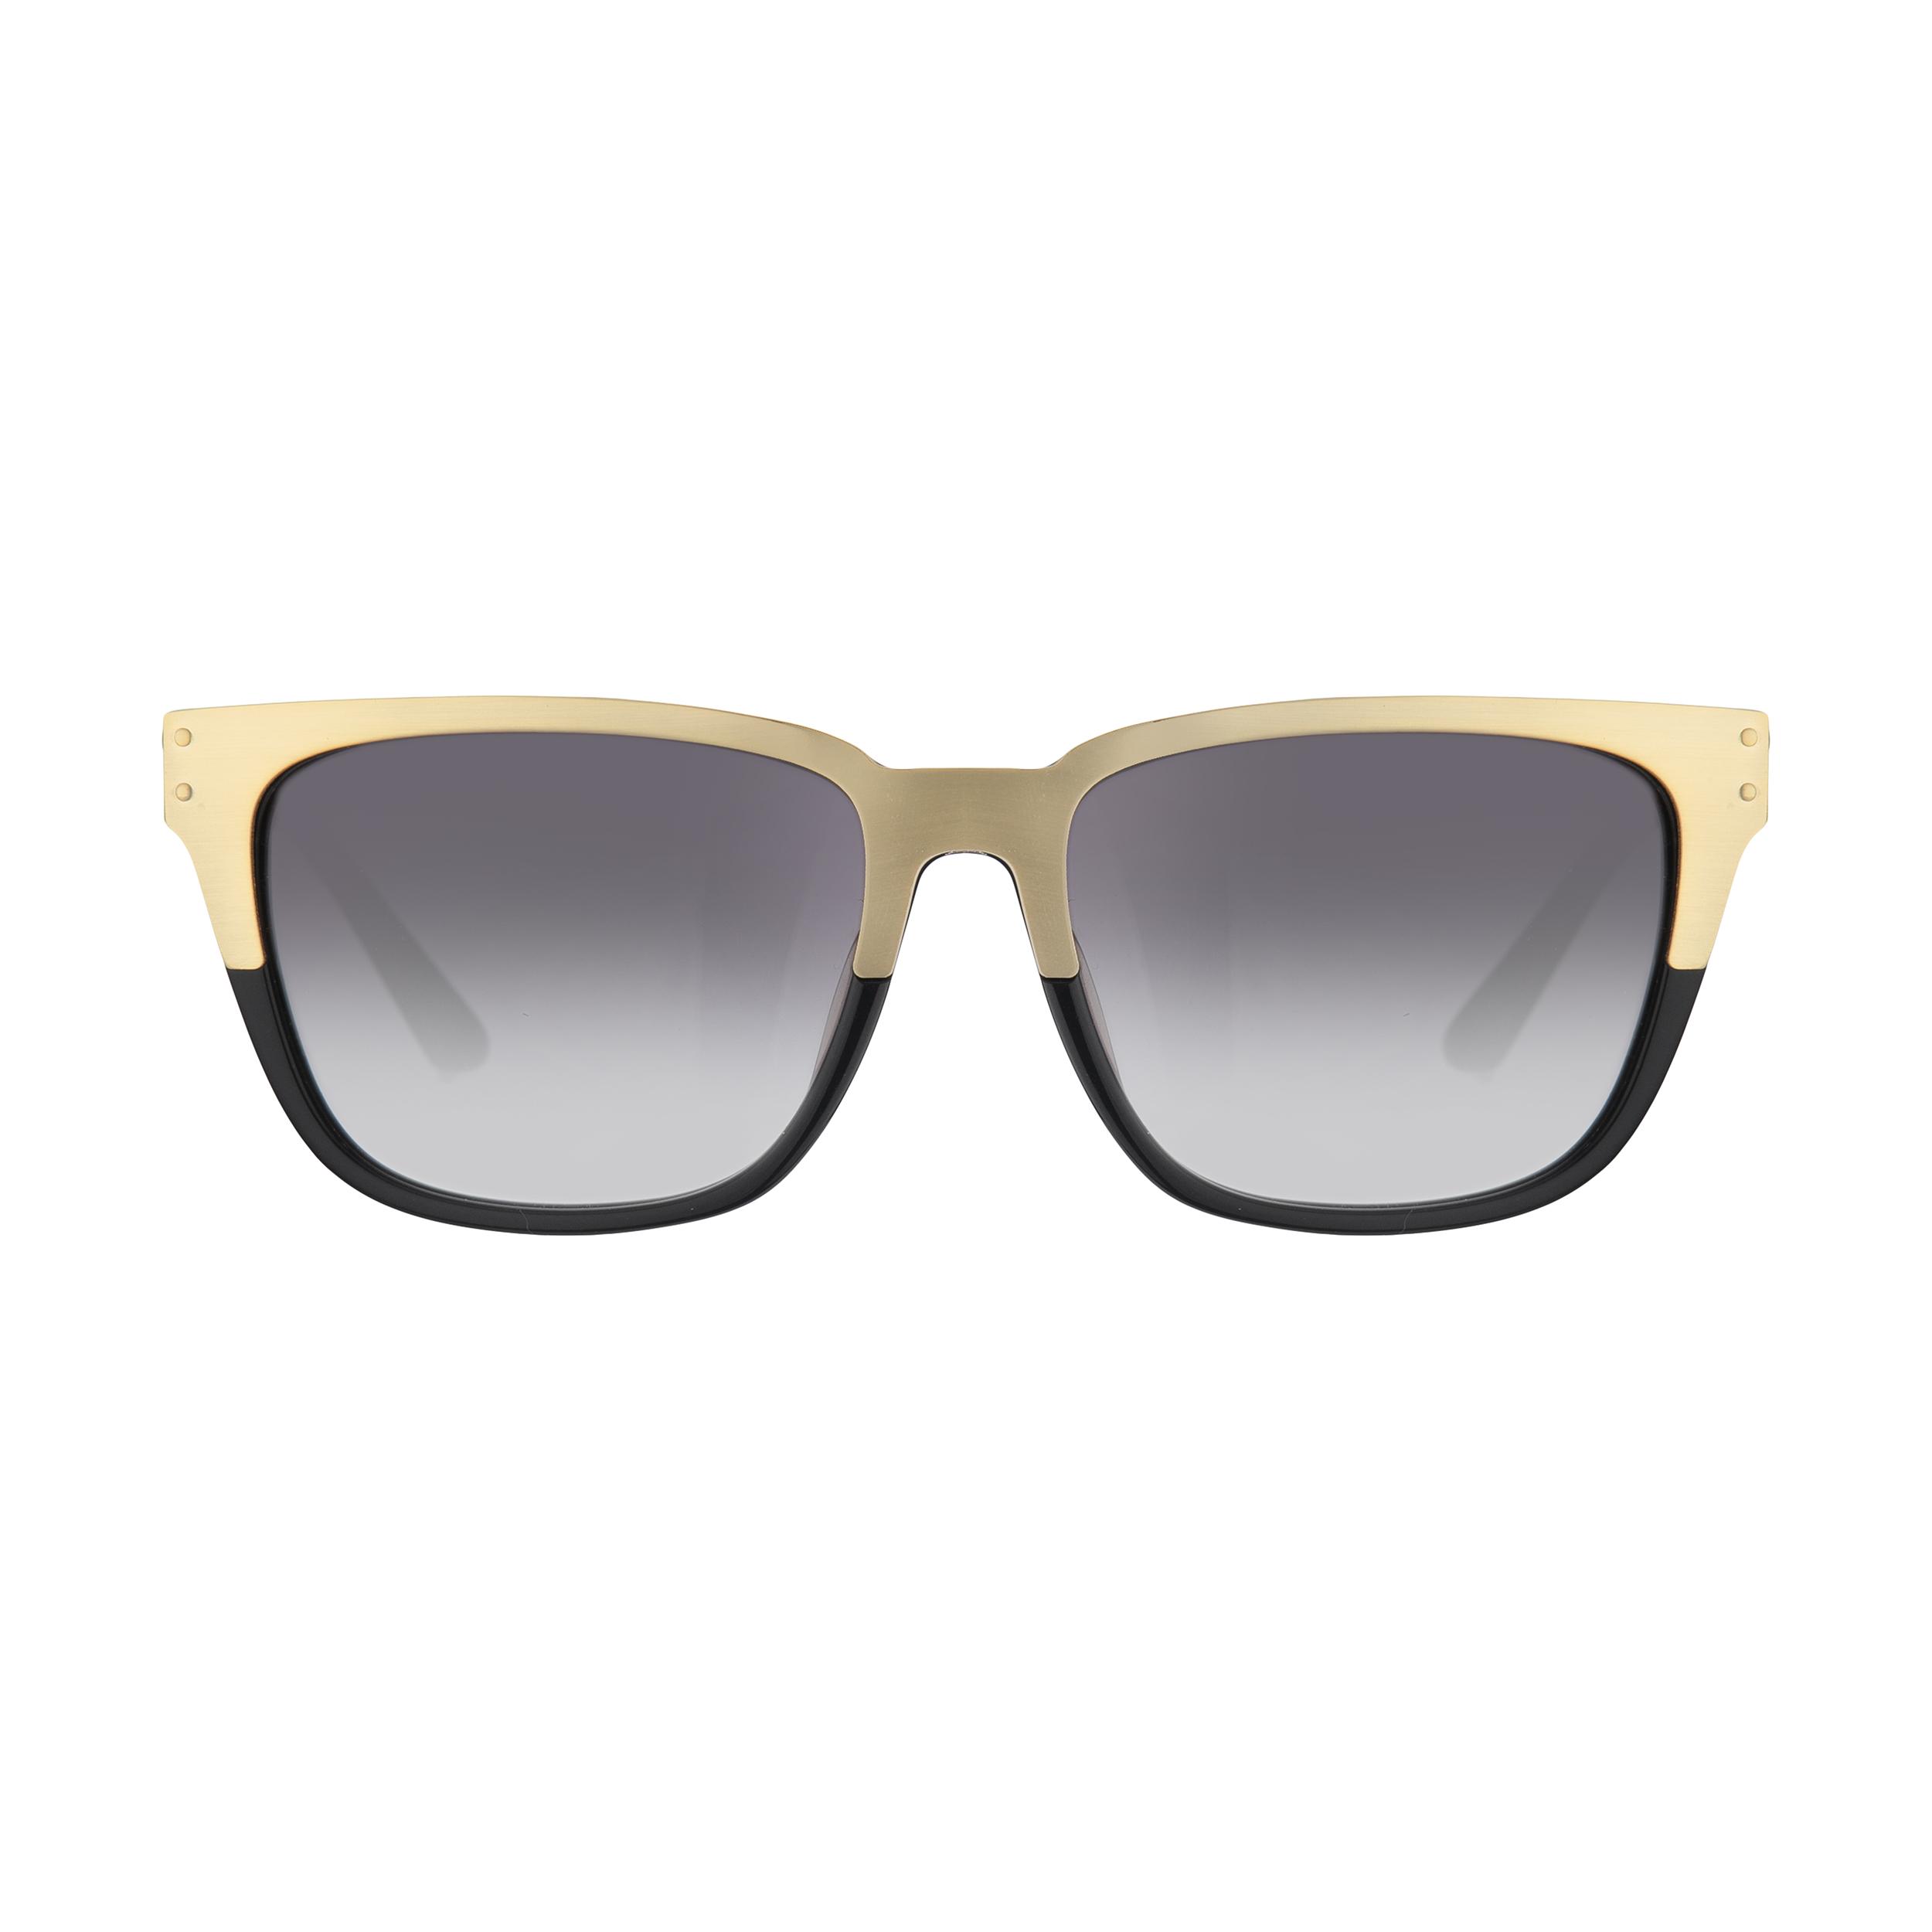 عینک آفتابی کلویی مدل 2149